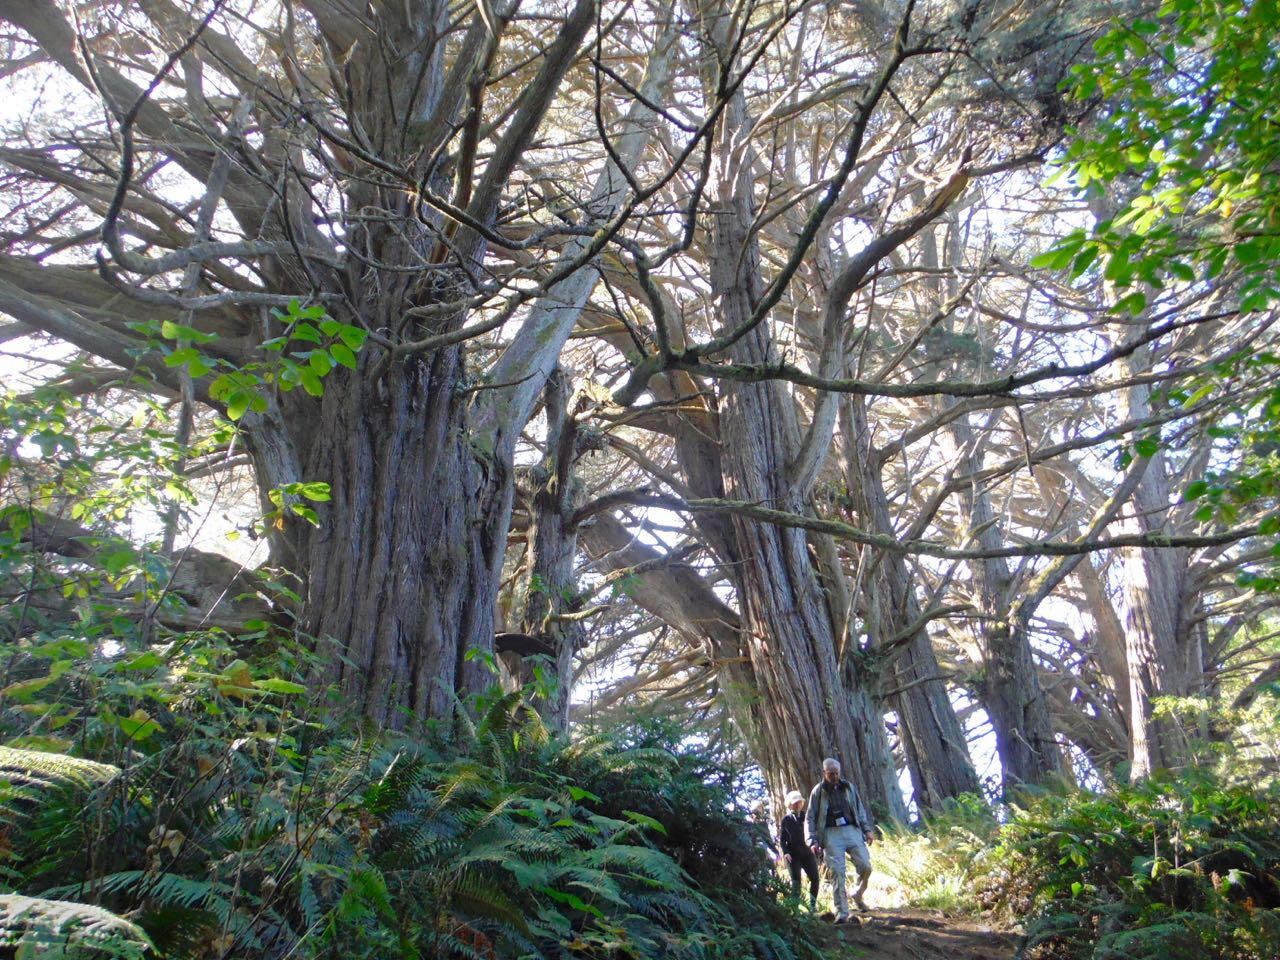 Redwoods 2017 10 08 191 Of 287